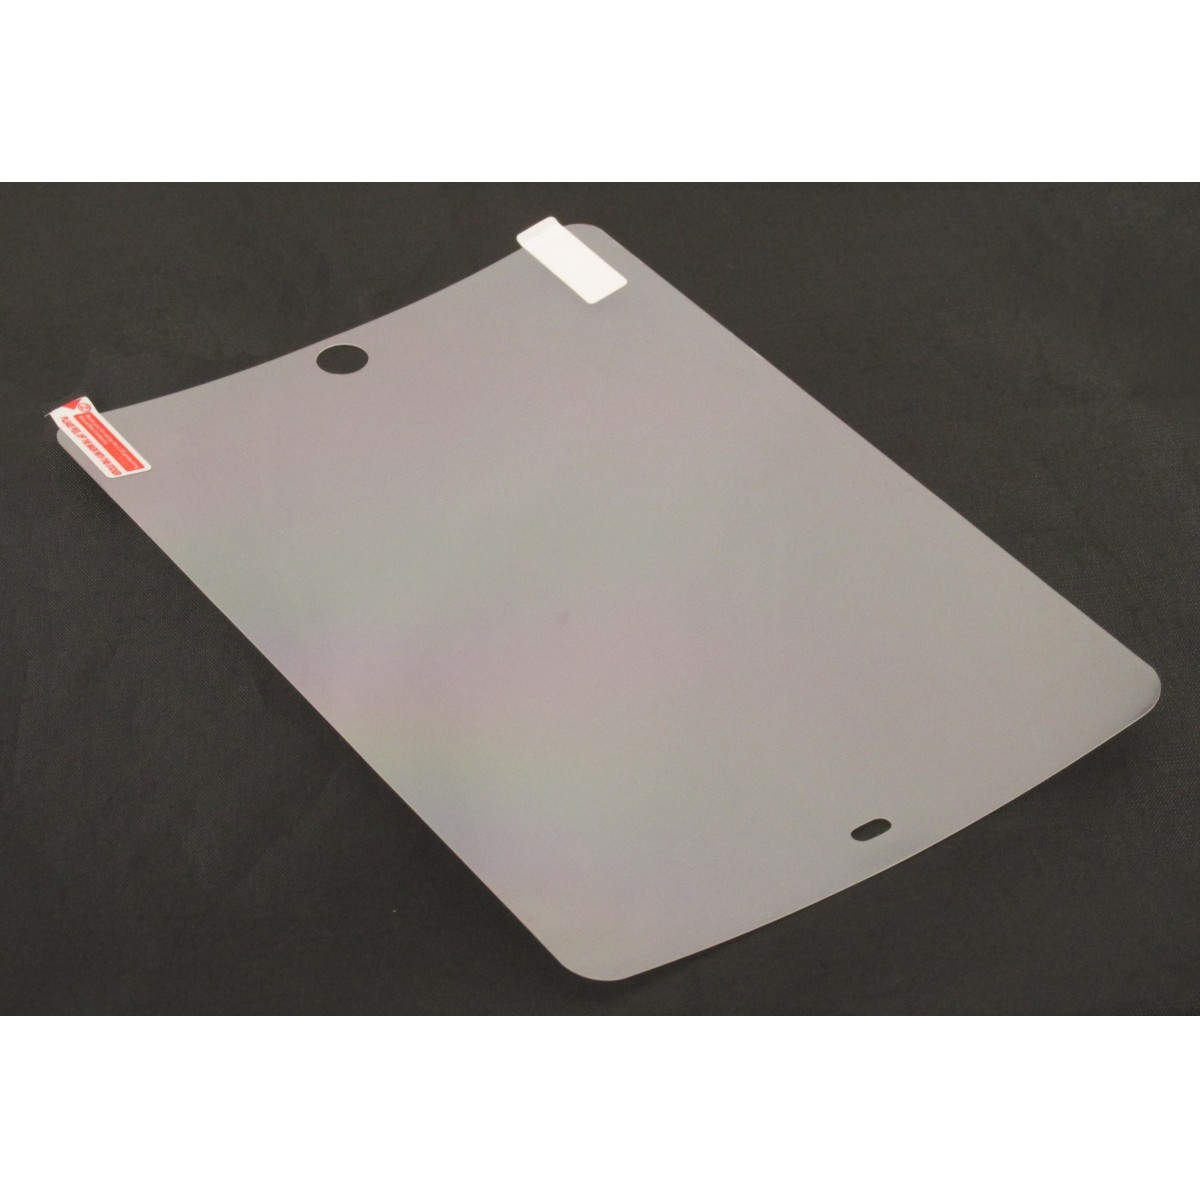 Pelicula Protetora para Ipad Mini Fosca